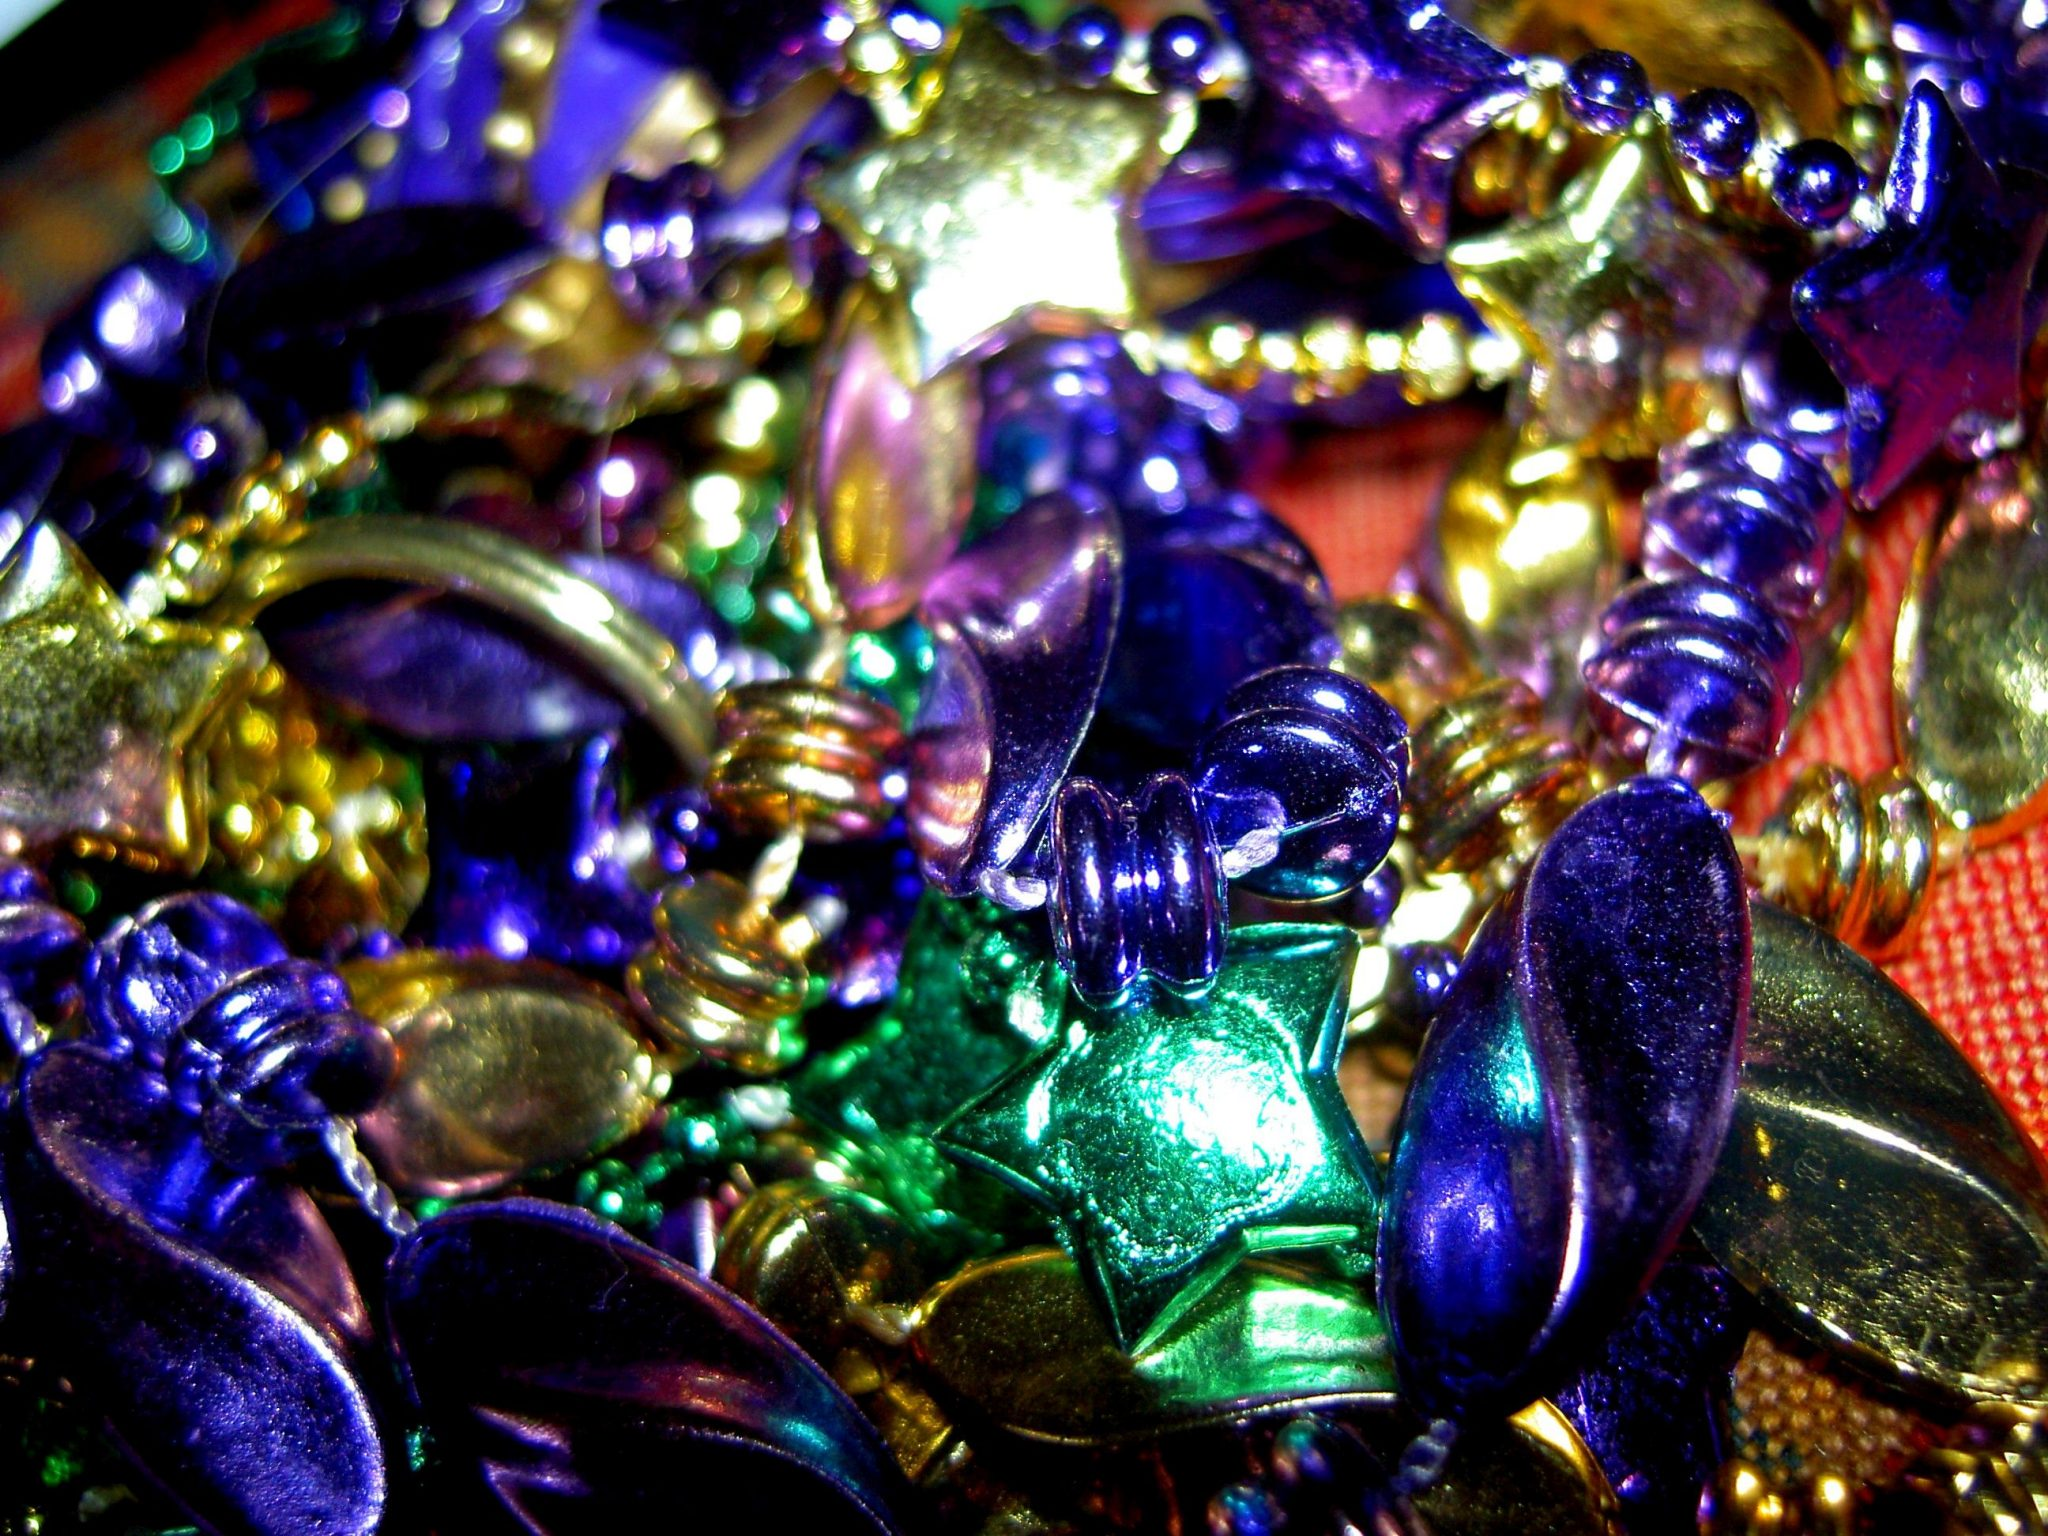 How to Host a Backyard Mardi Gras Theme Party